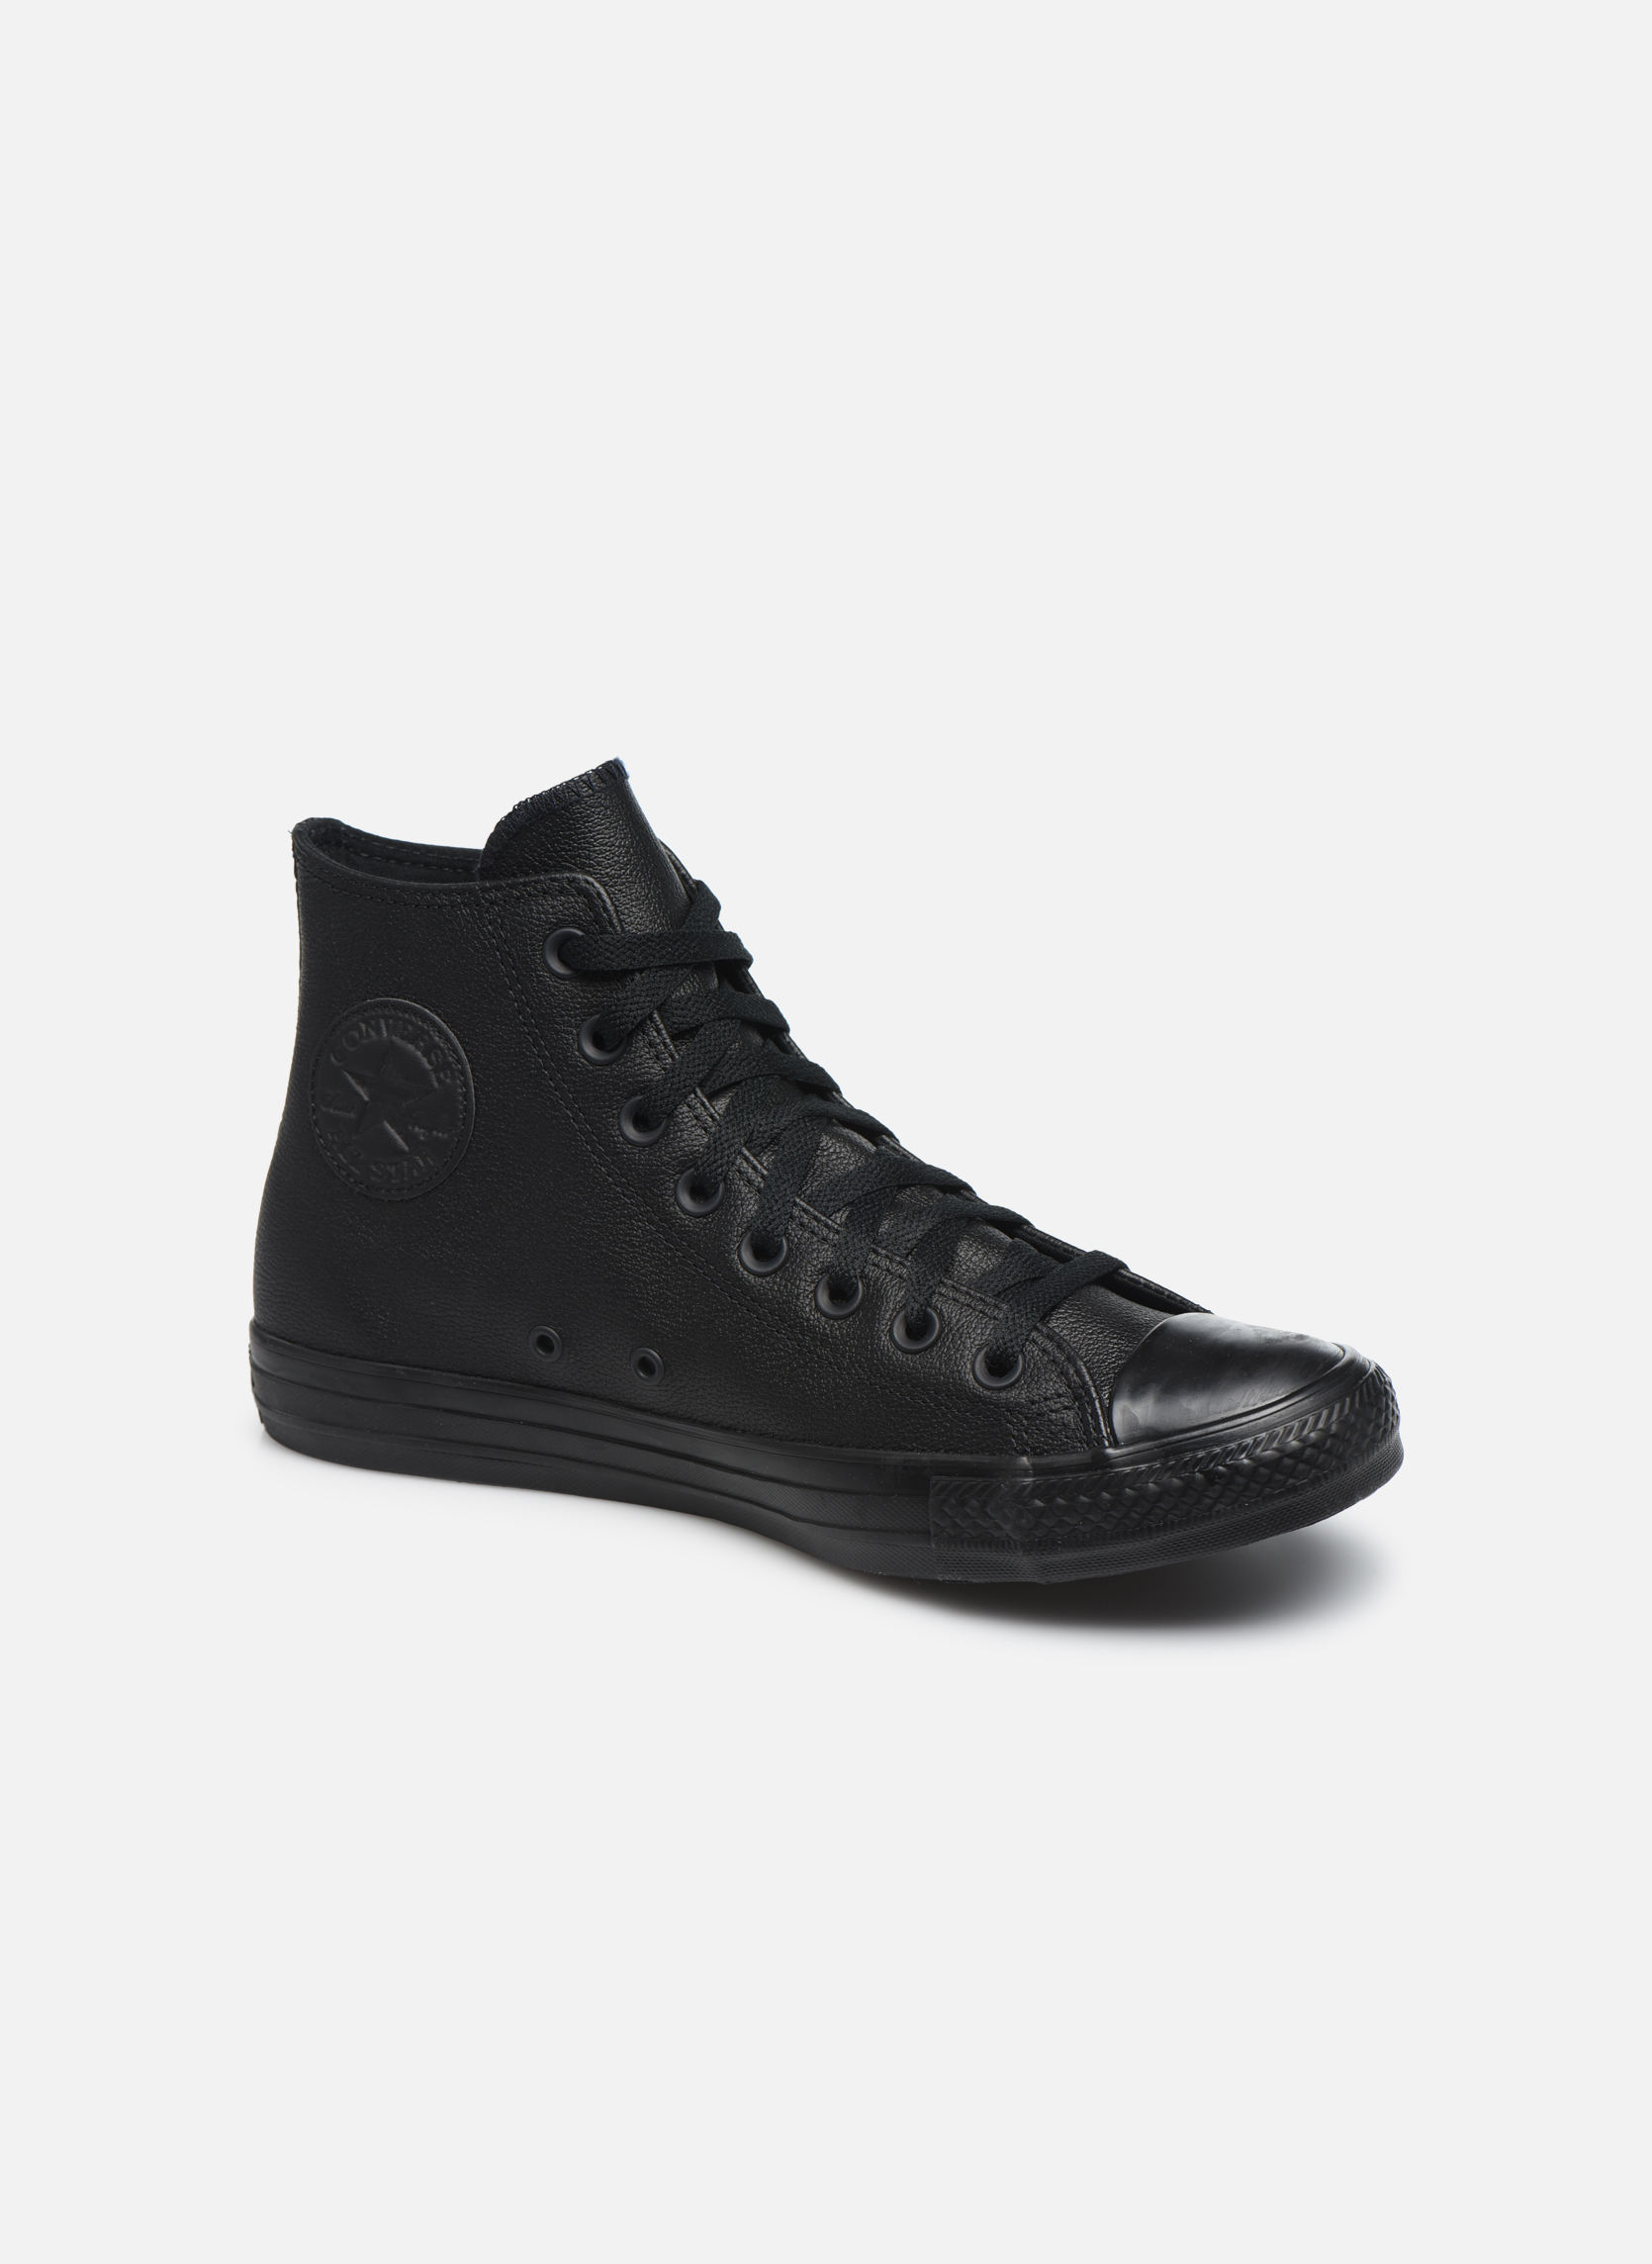 Sneakers Converse Chuck Taylor All Star Mono Leather Hi M Svart detaljerad bild på paret